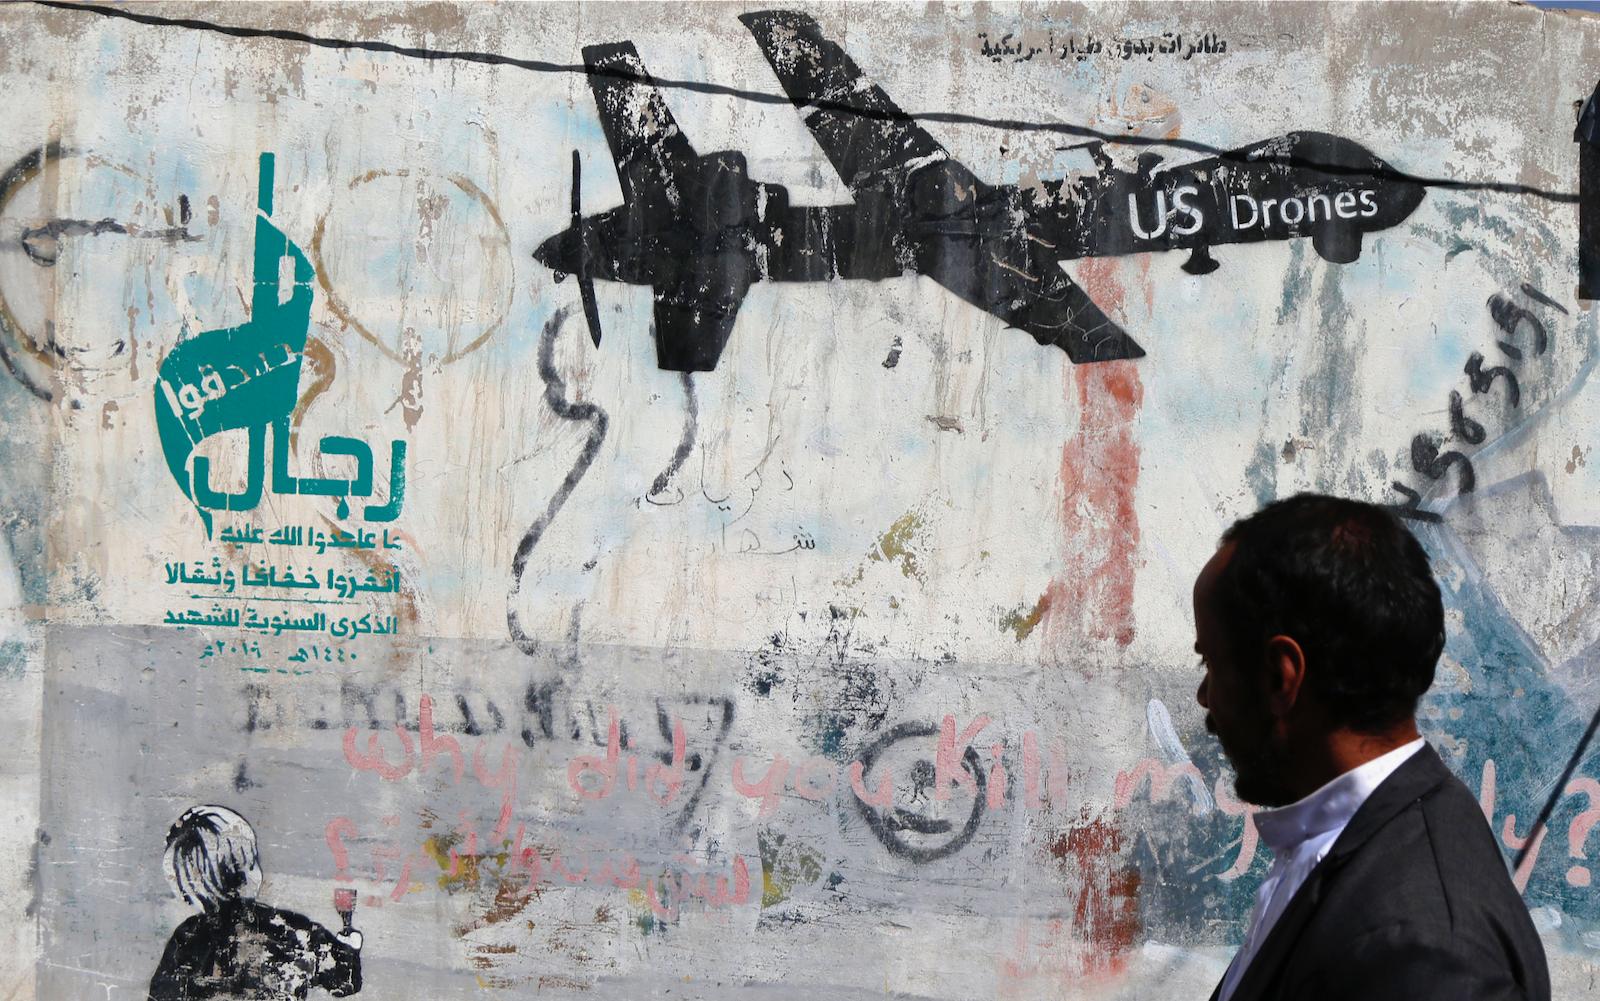 A man passing a wall with graffiti in Sana'a, Yemen